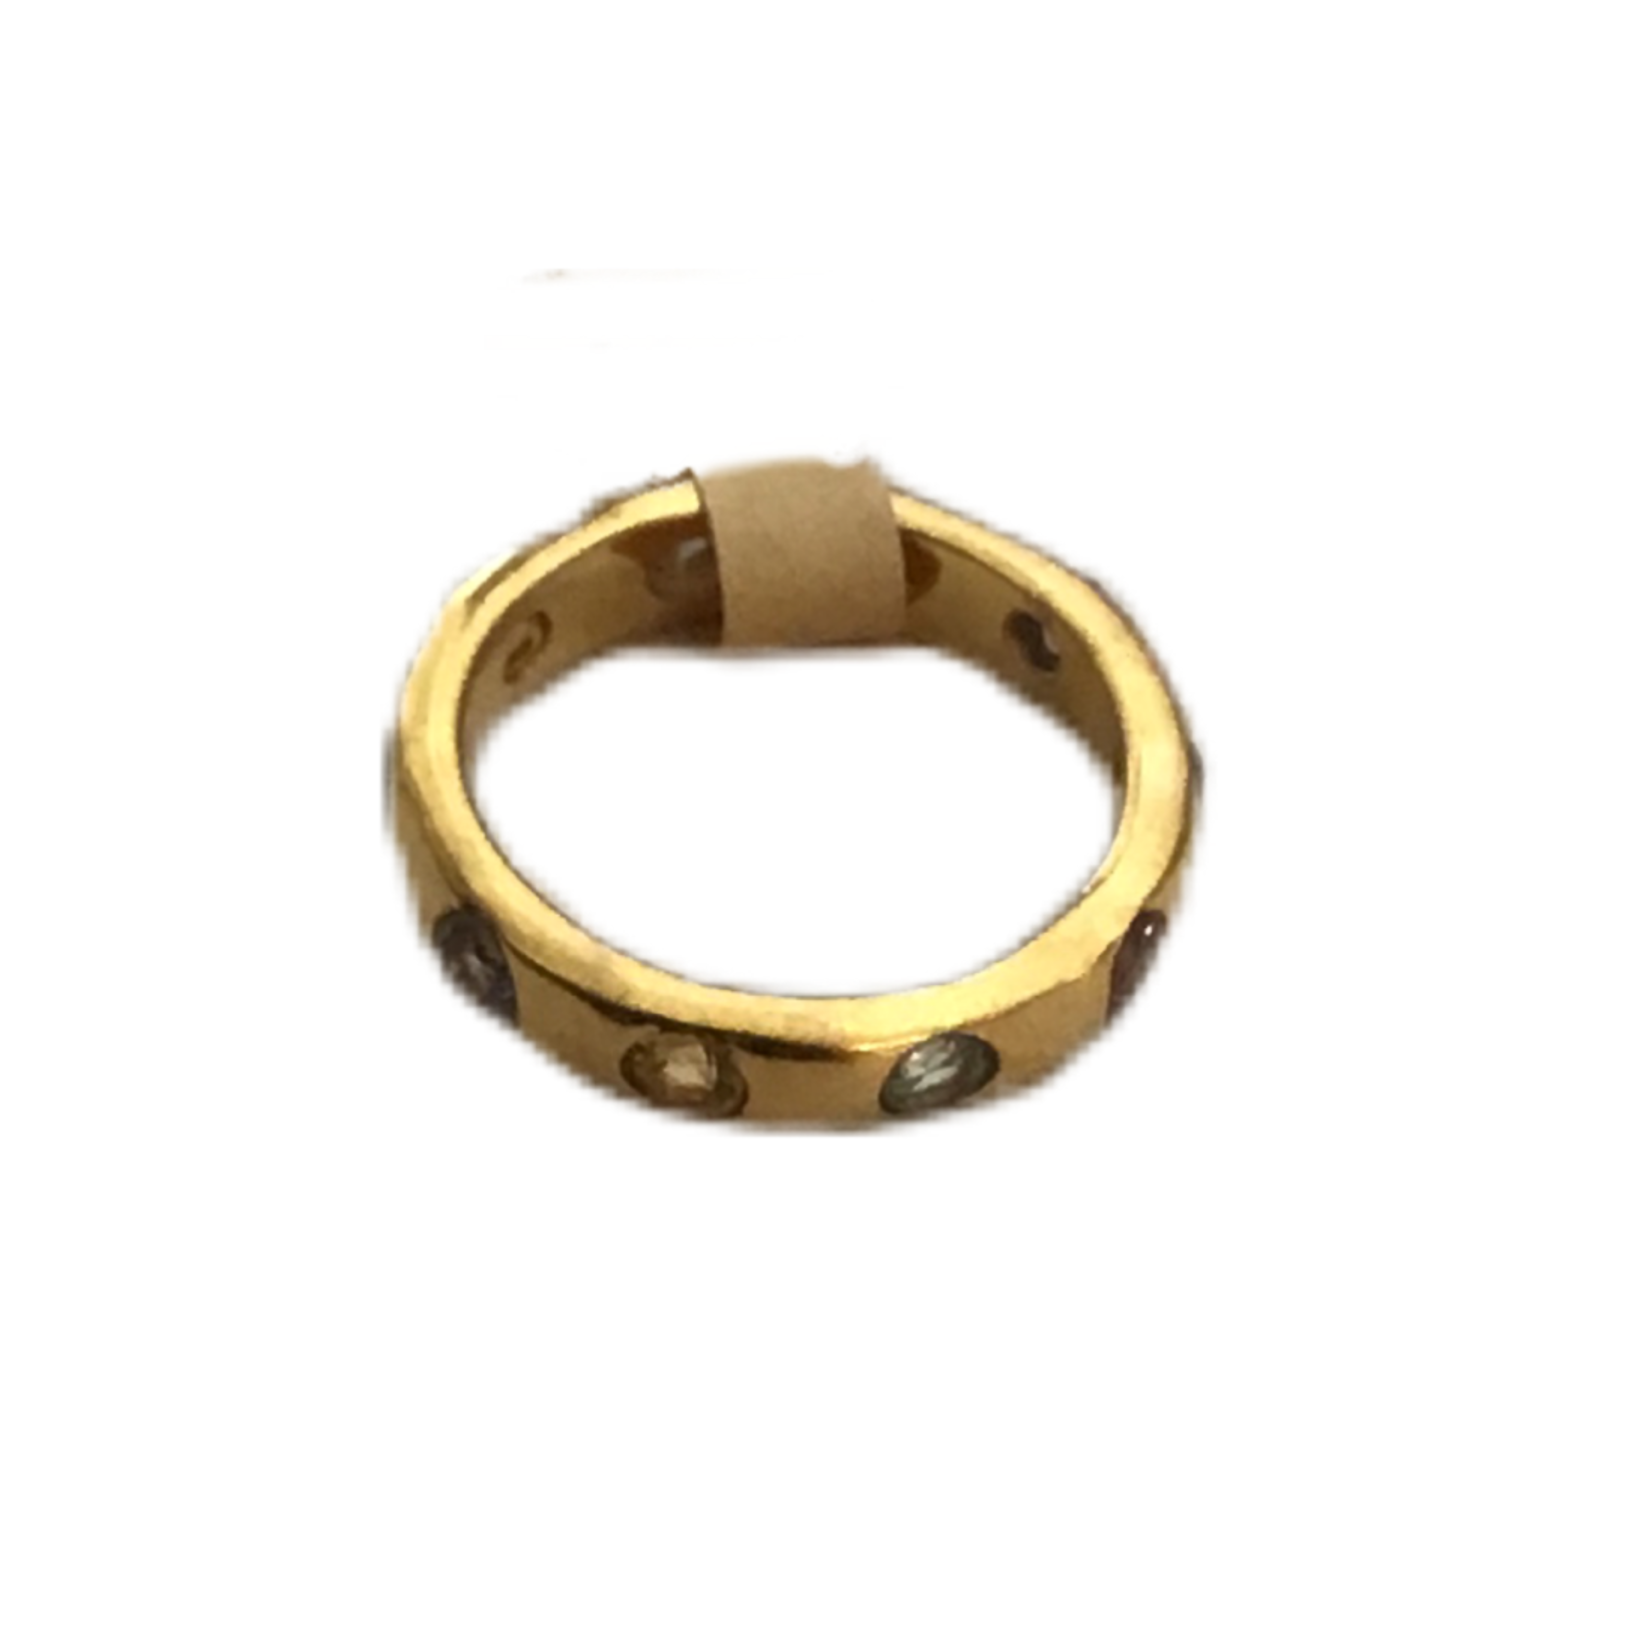 Wildsea Band of Gypsies Ring